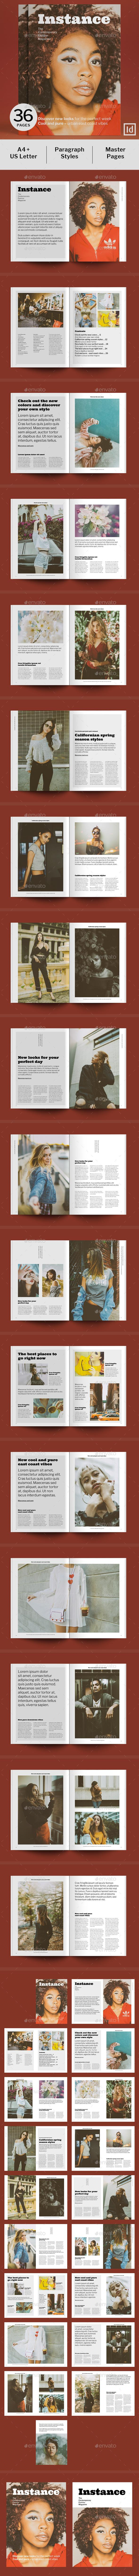 Instance – The Contemporary Fashion Magazine - Magazines Print Templates